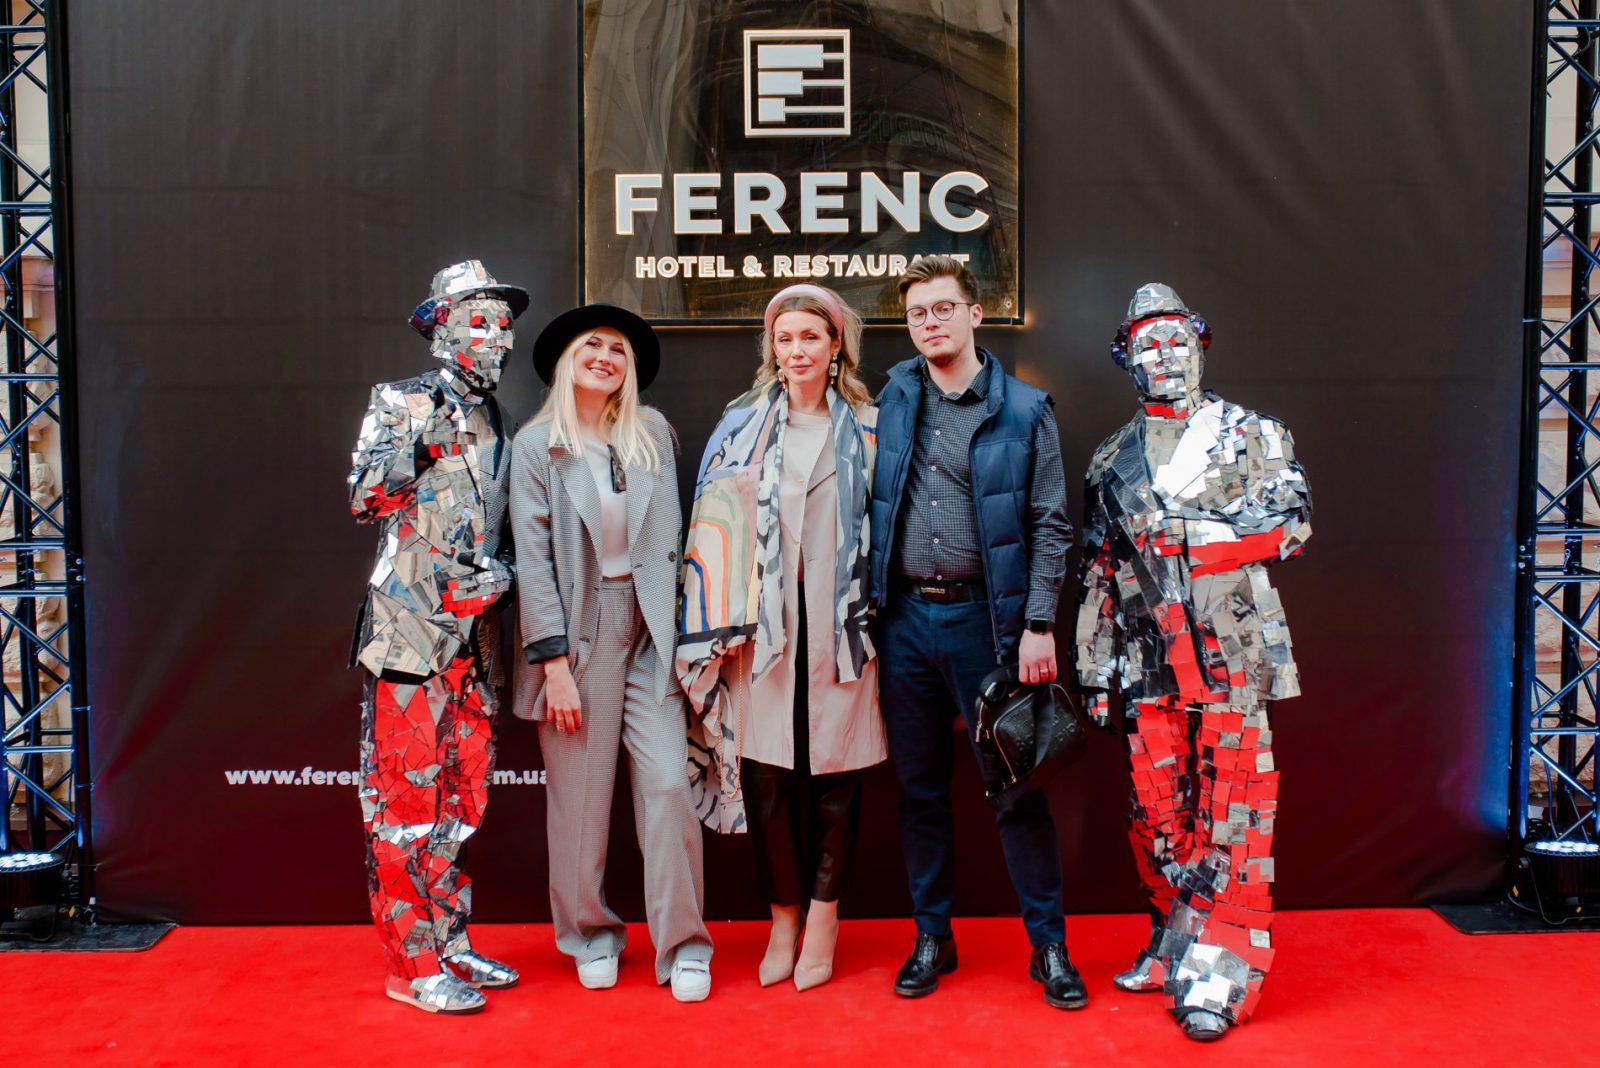 Ferenc0162